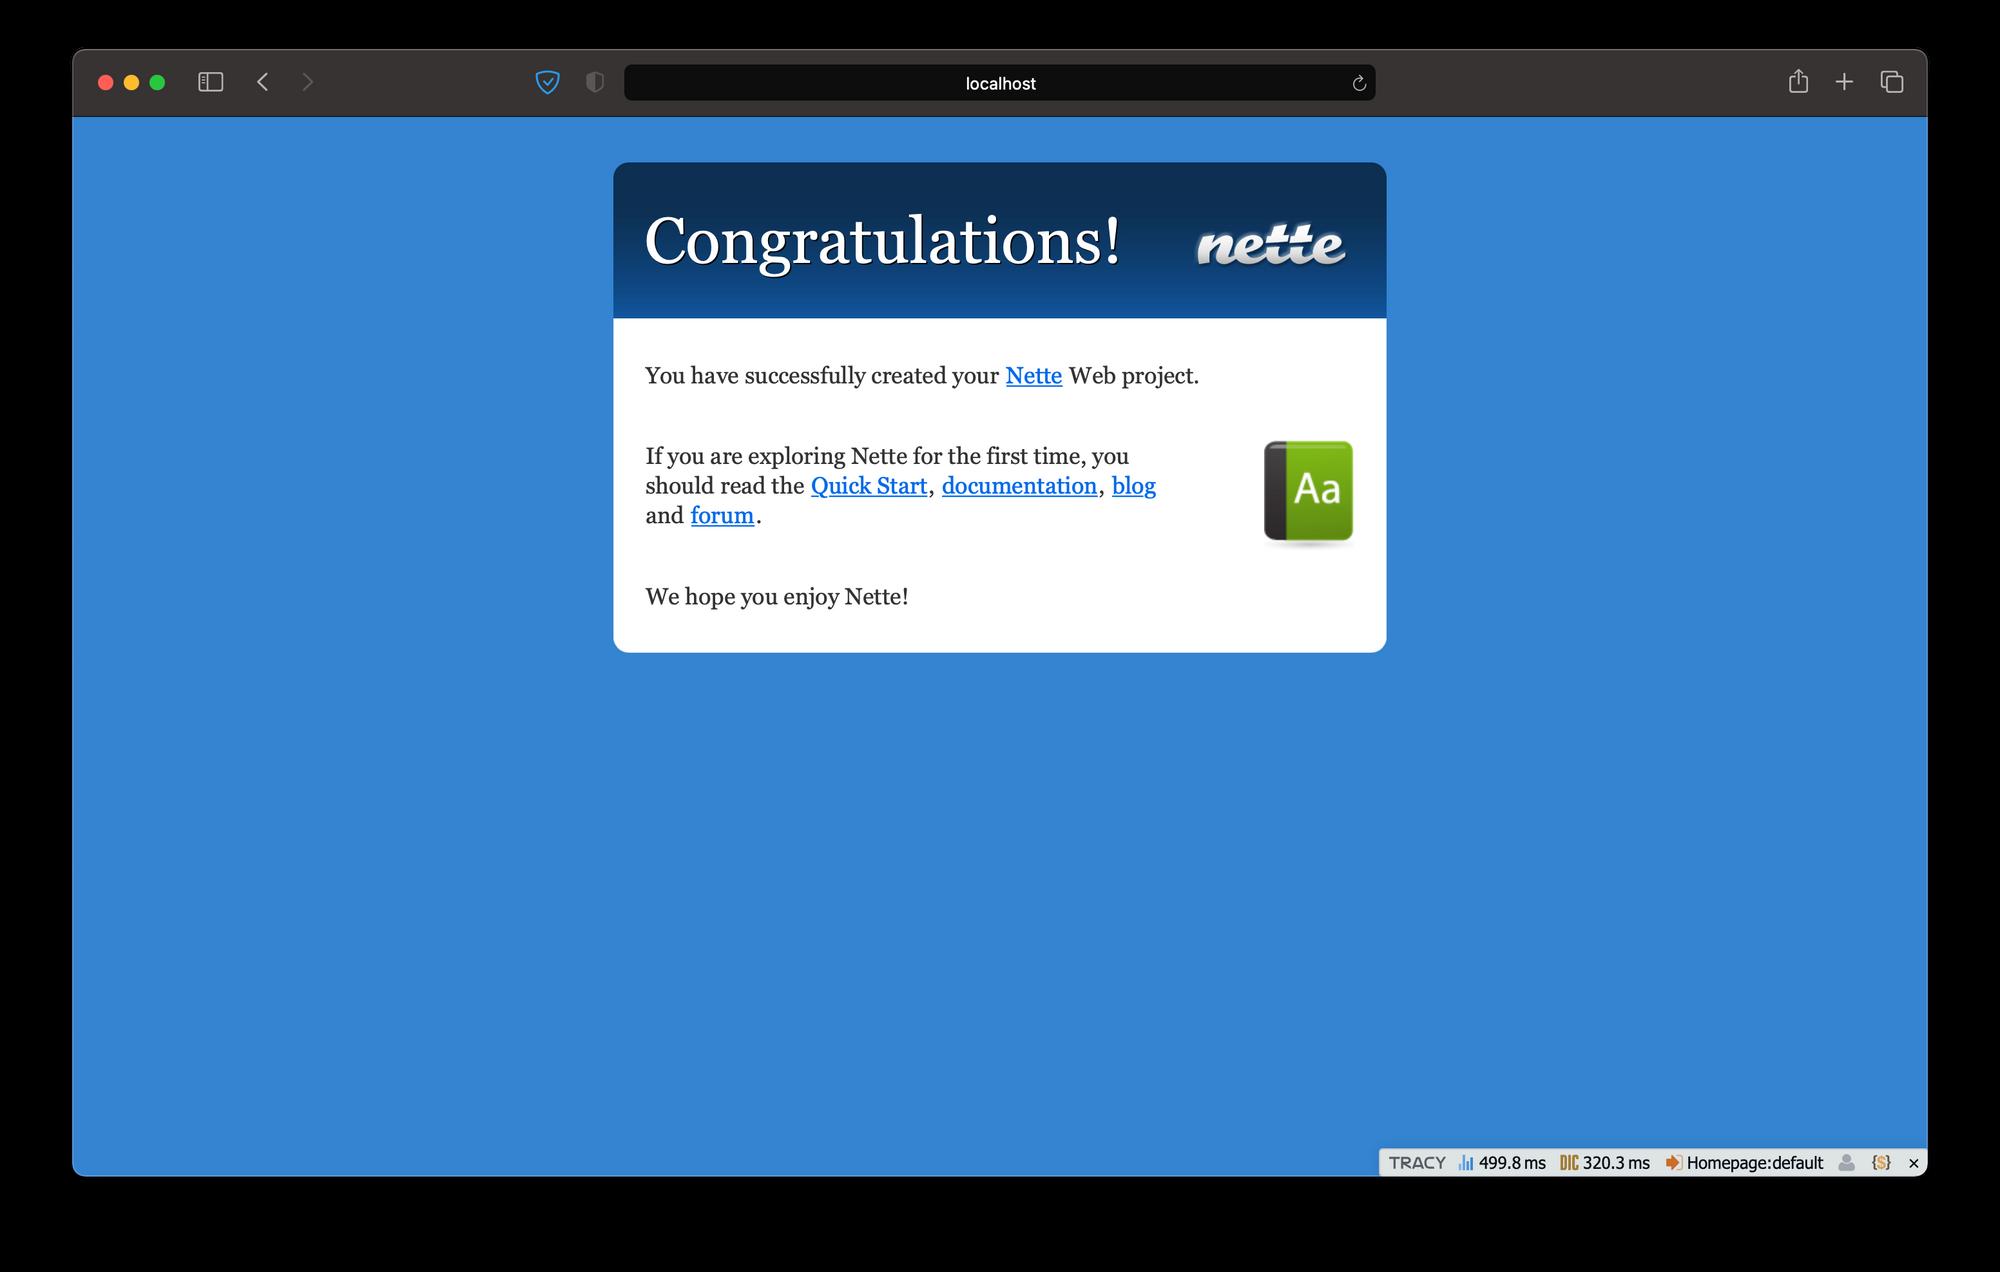 Clean Nette web project